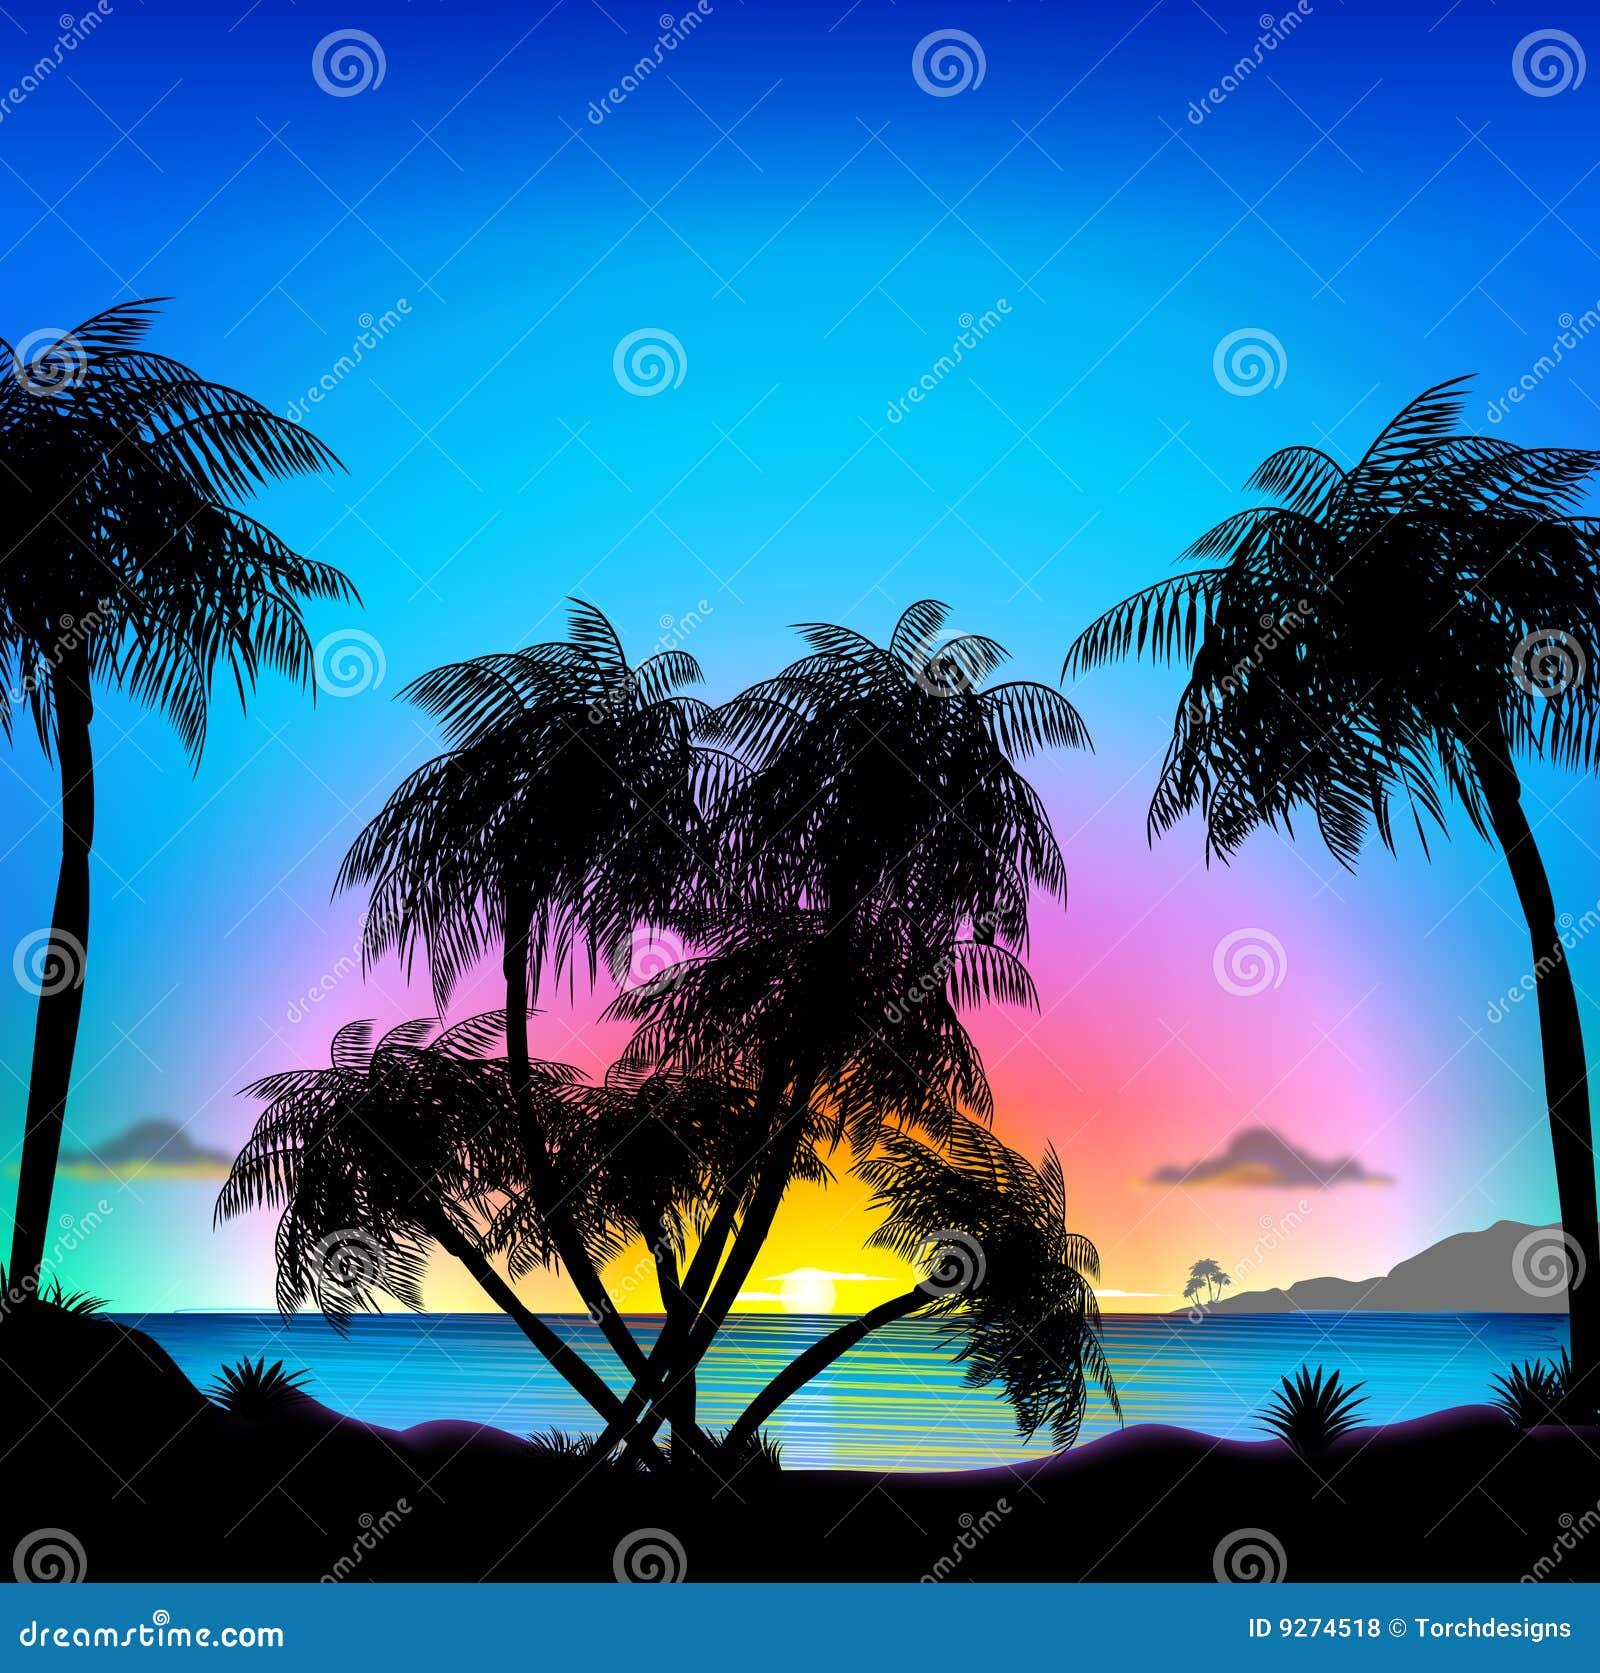 Tropical Beach At Sunset Stock Illustration. Illustration